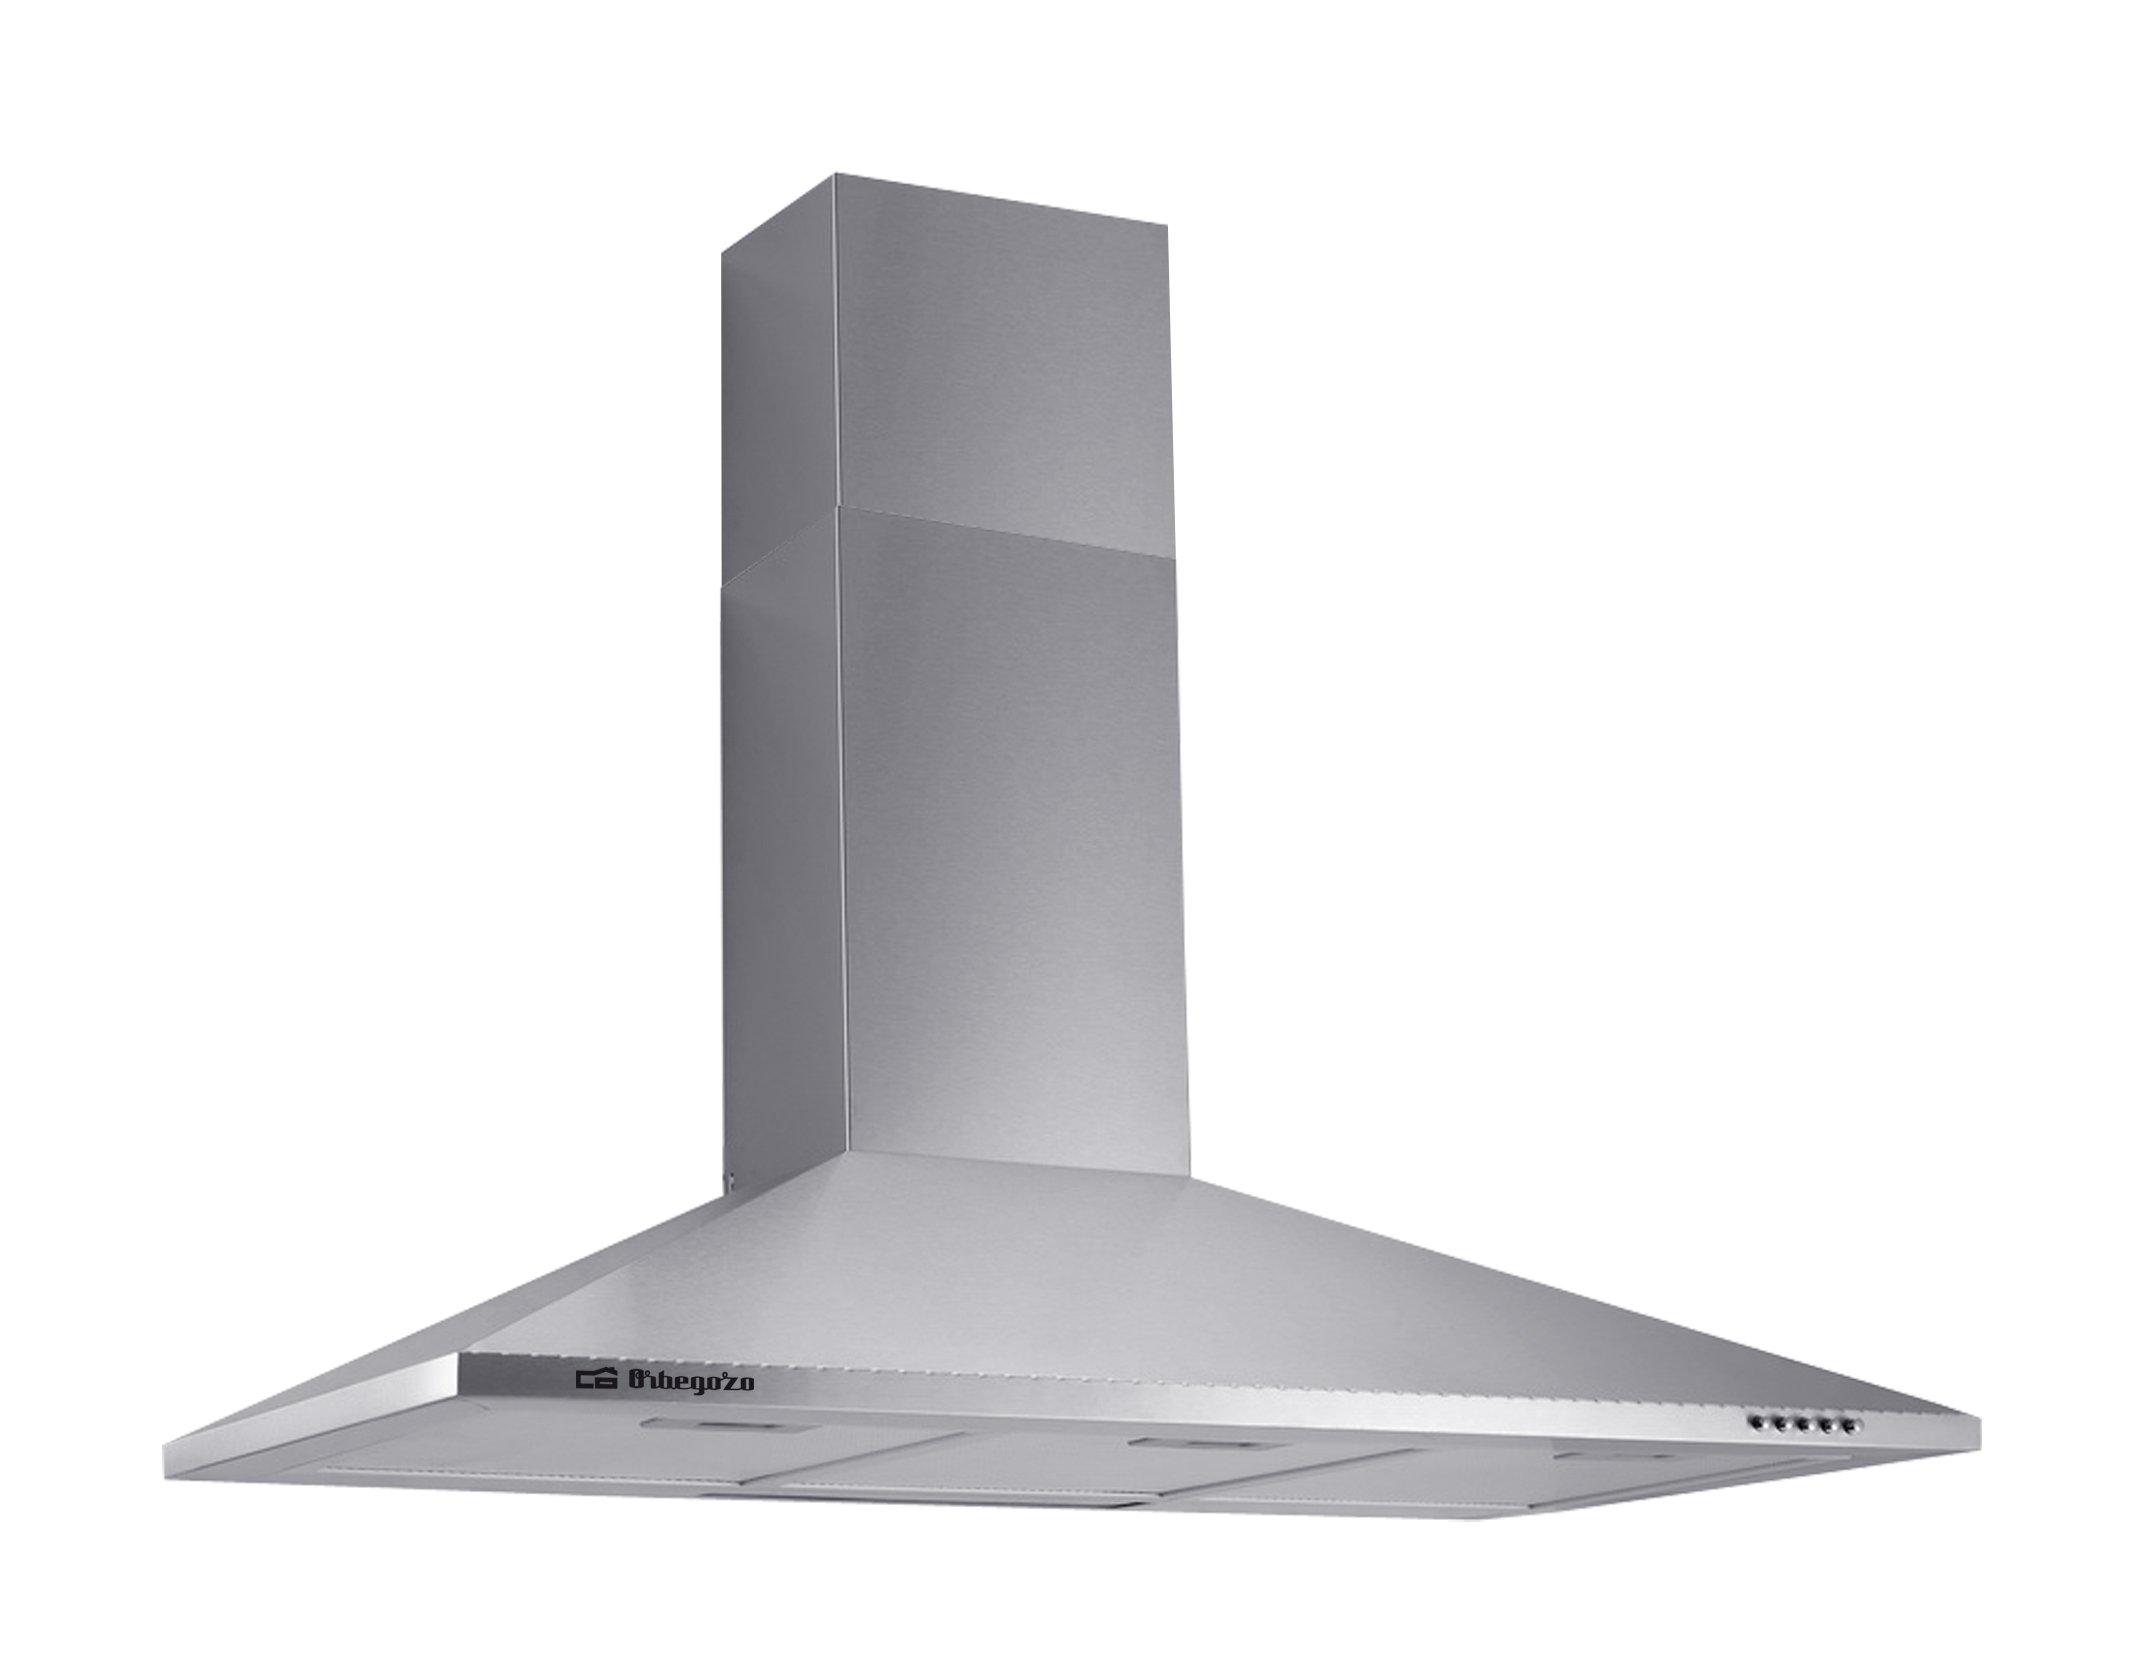 Orbegozo DS 59190 – Campana extractora decorativa, 3 niveles de potencia, luces LED, 3 filtros desmontables, mandos…